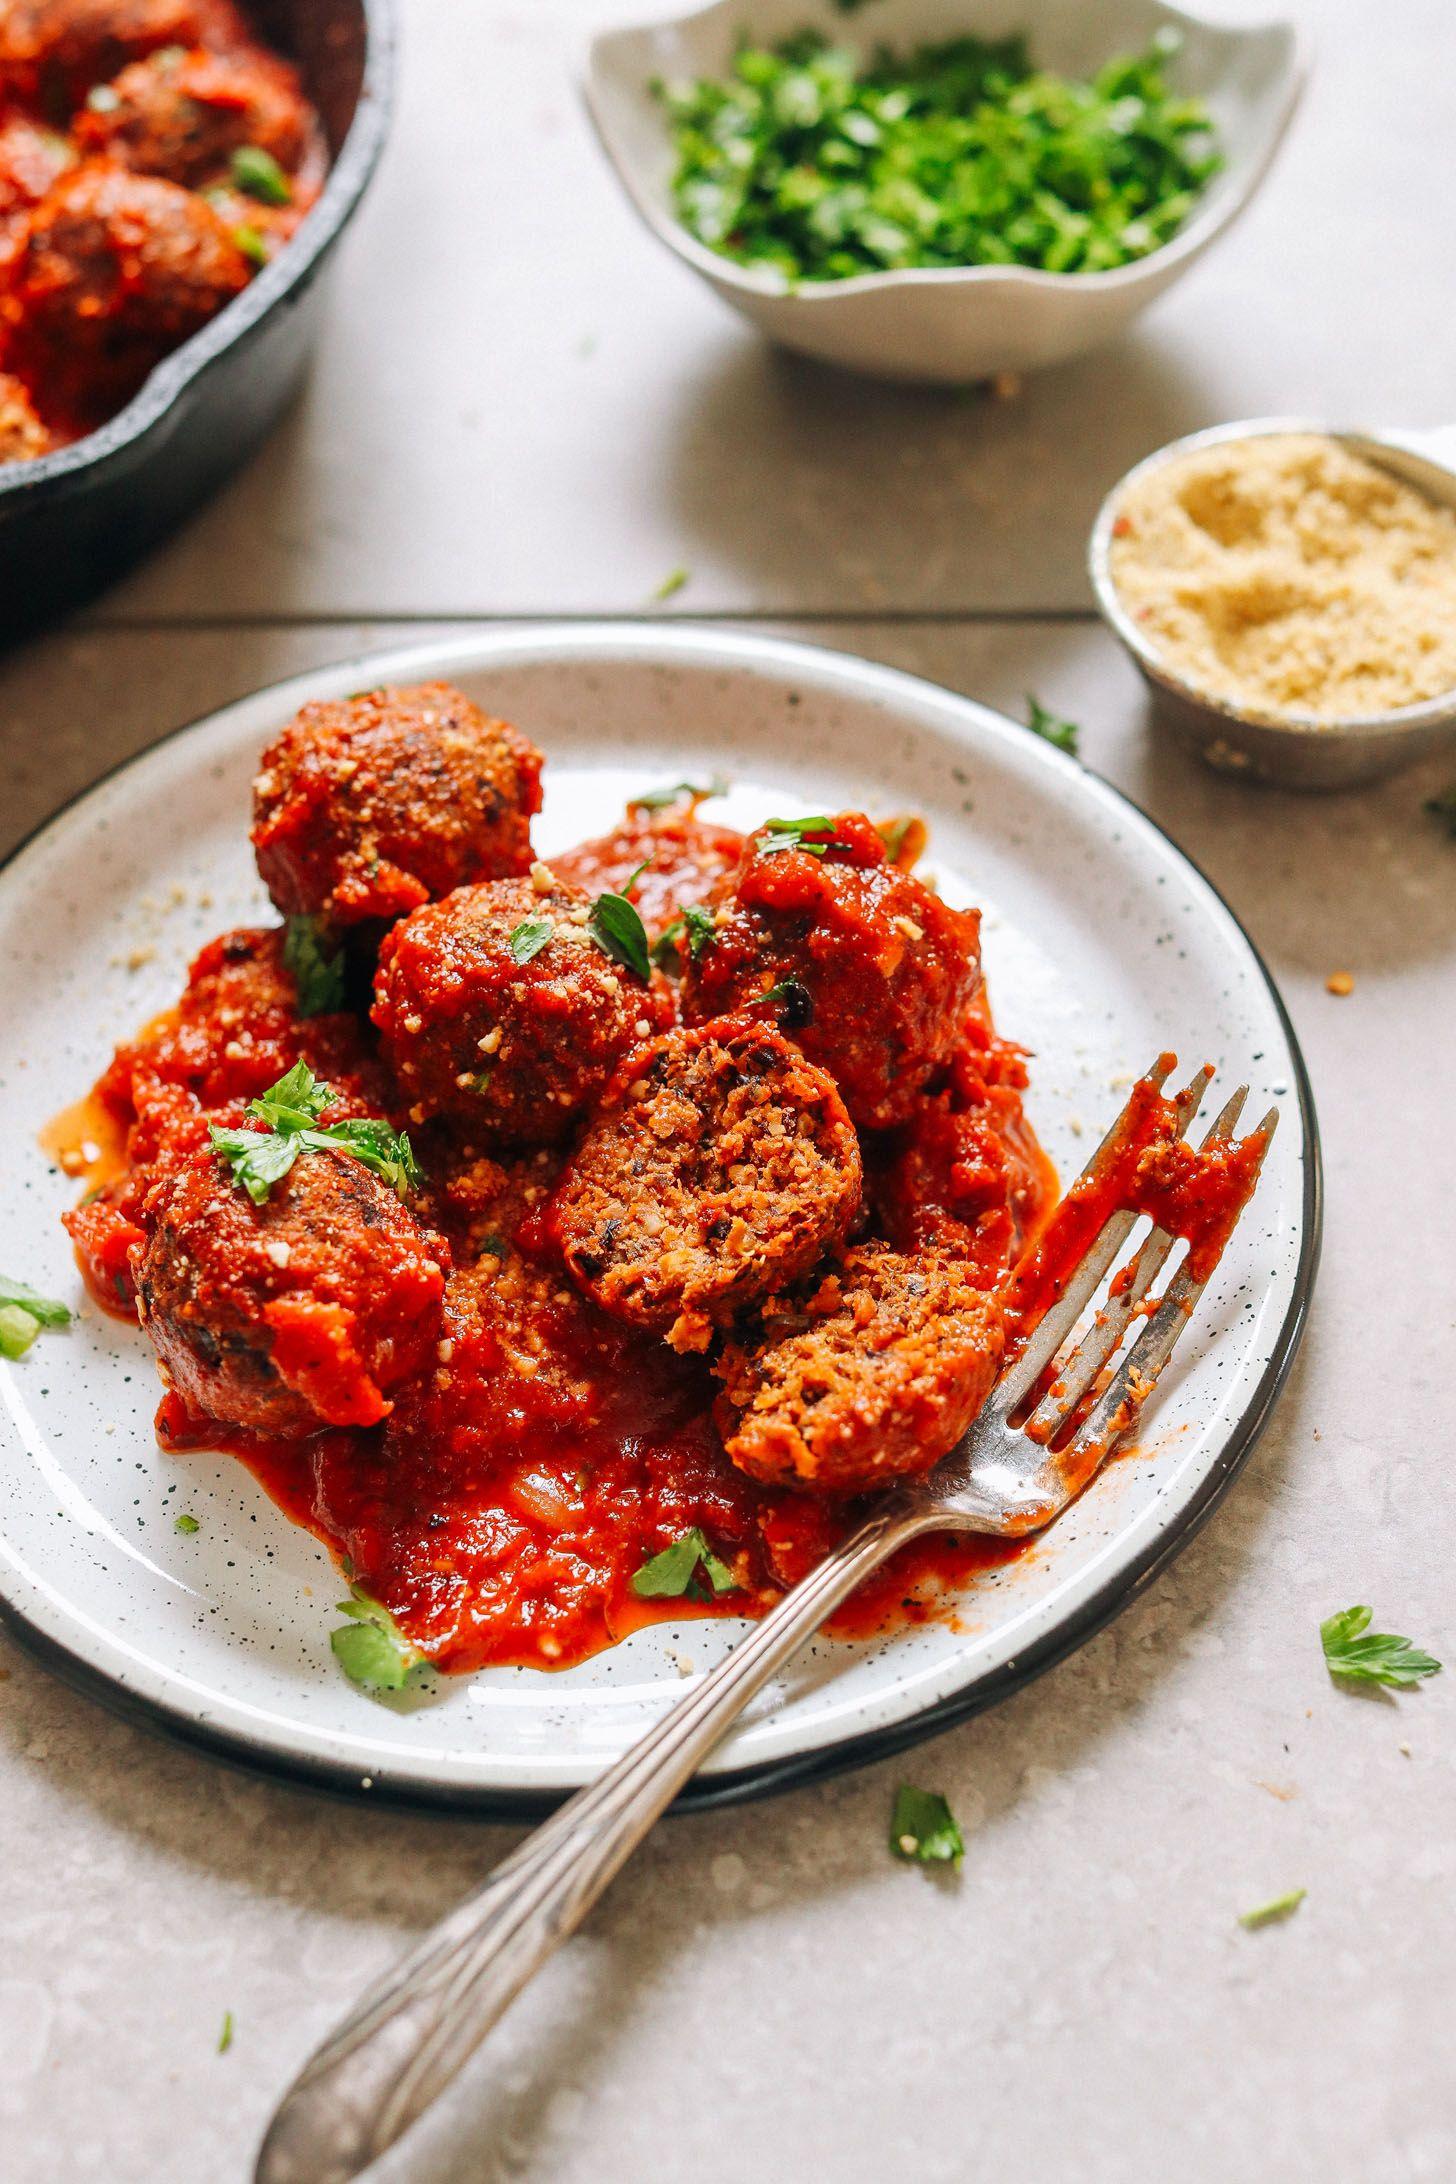 The Best Vegan Meatballs Minimalist Baker Recipes Recipe Vegan Dinners Vegan Meatballs Whole Food Recipes